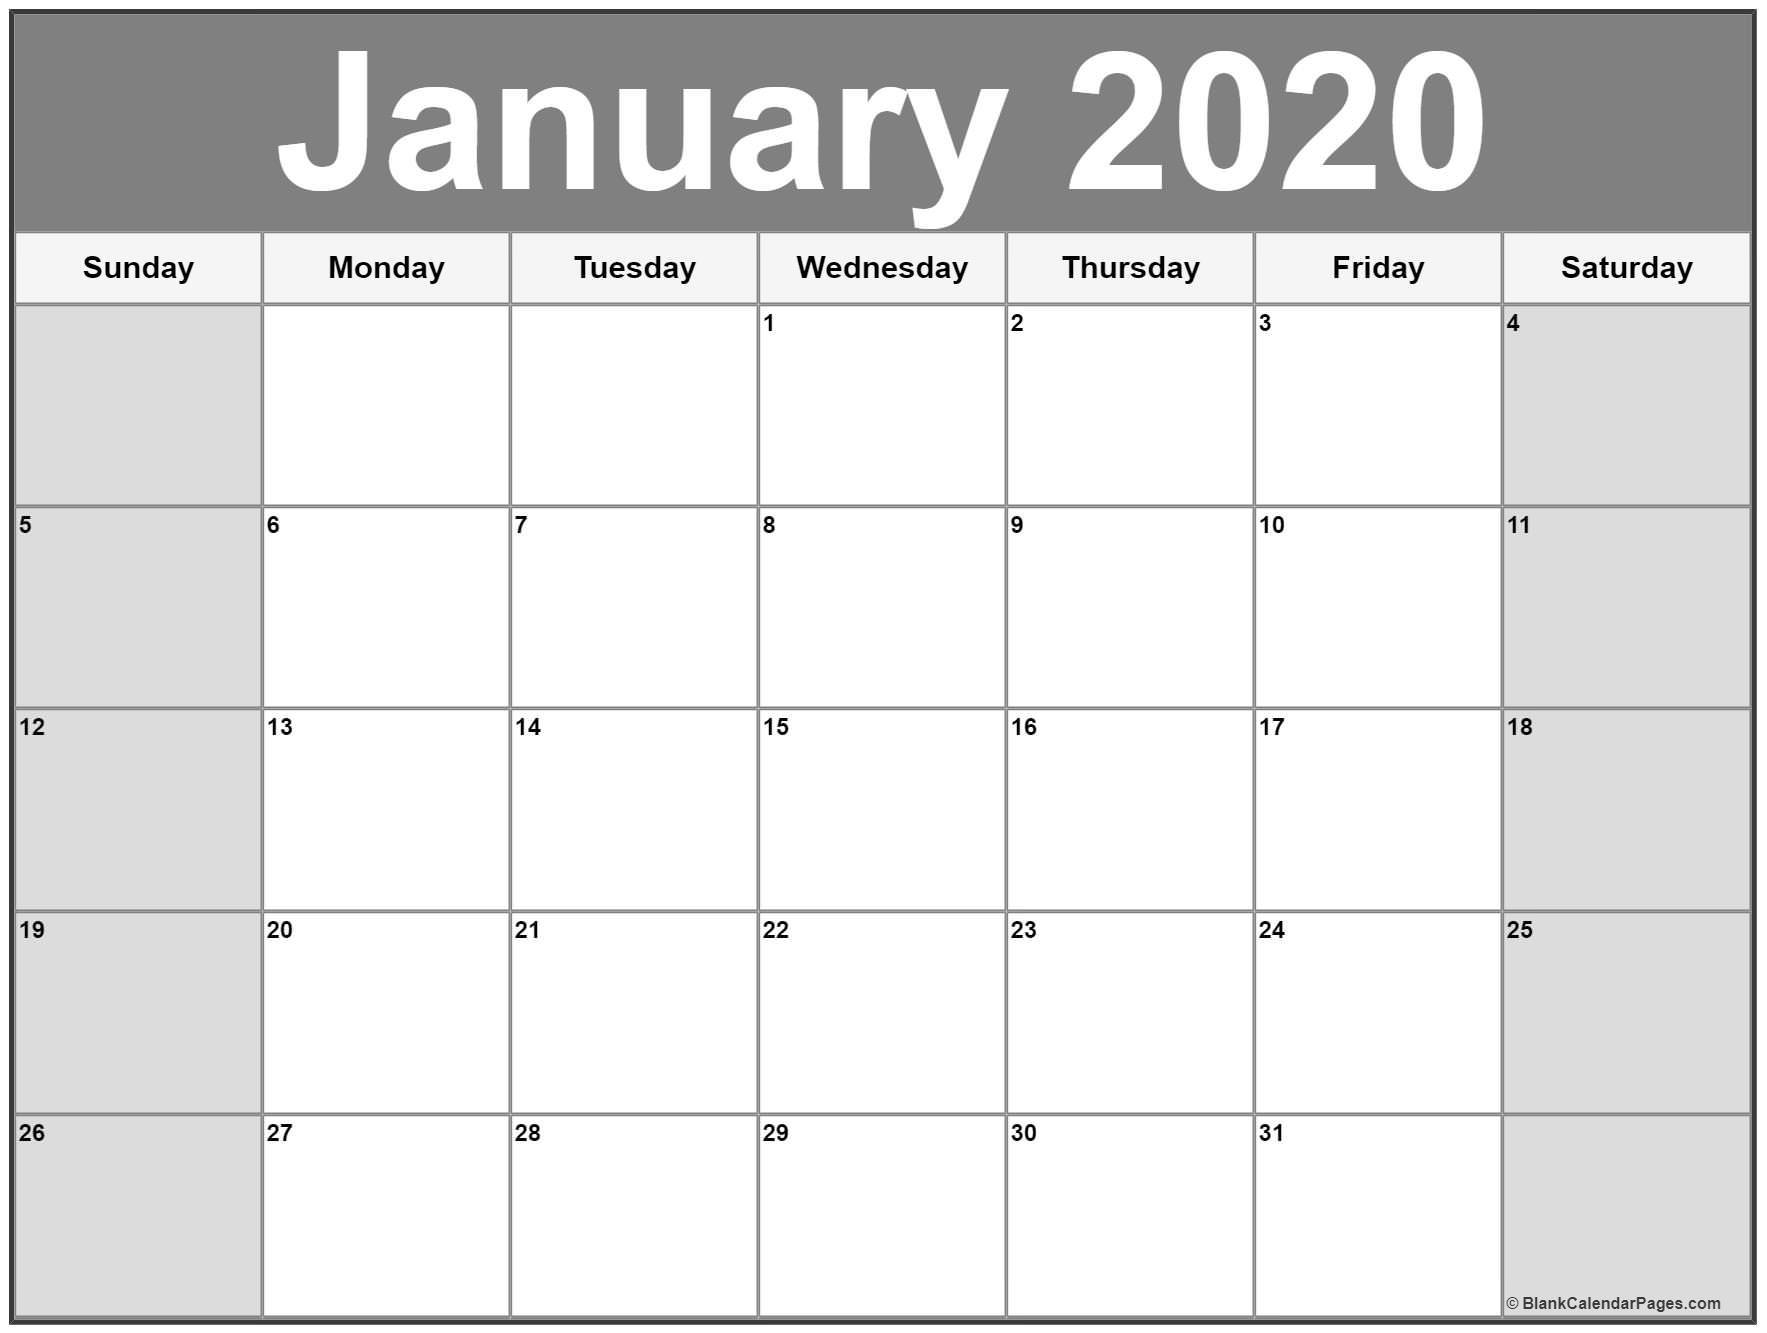 January 2020 Calendar | Free Printable Monthly Calendars-January 2020 Daily Calendar